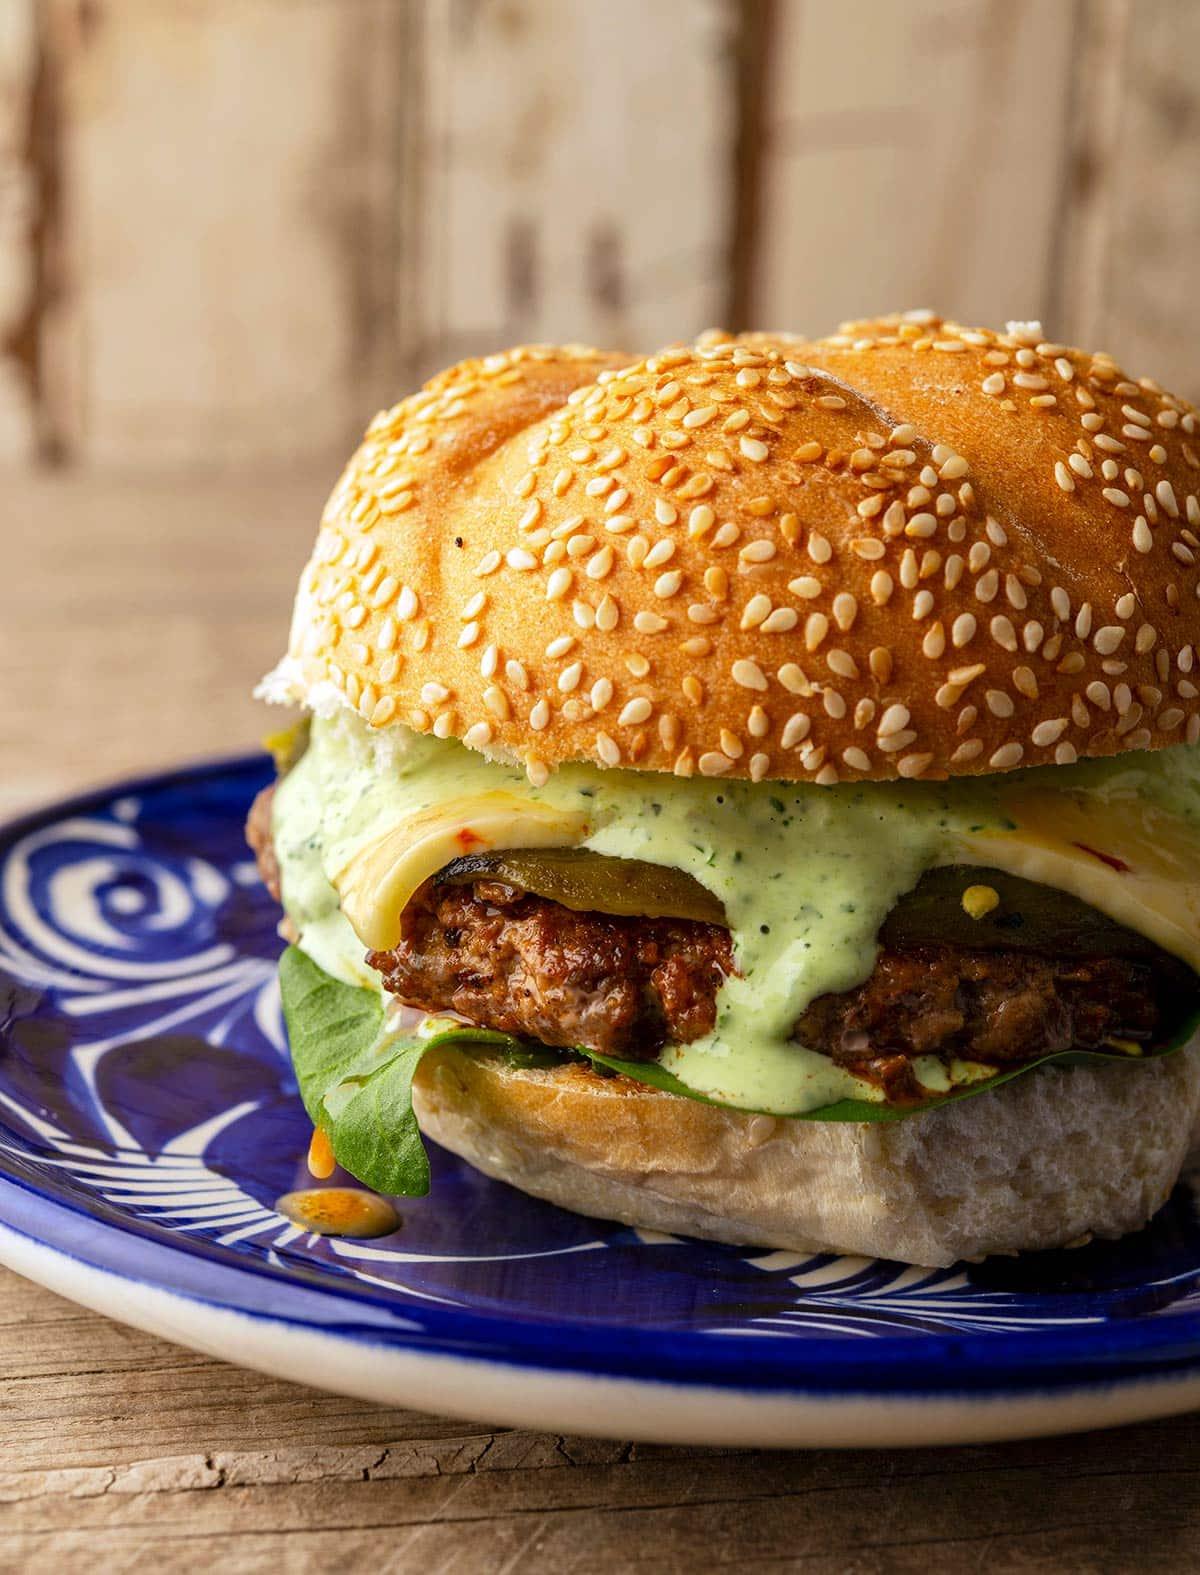 Closeup view of a chorizo burger on a plate